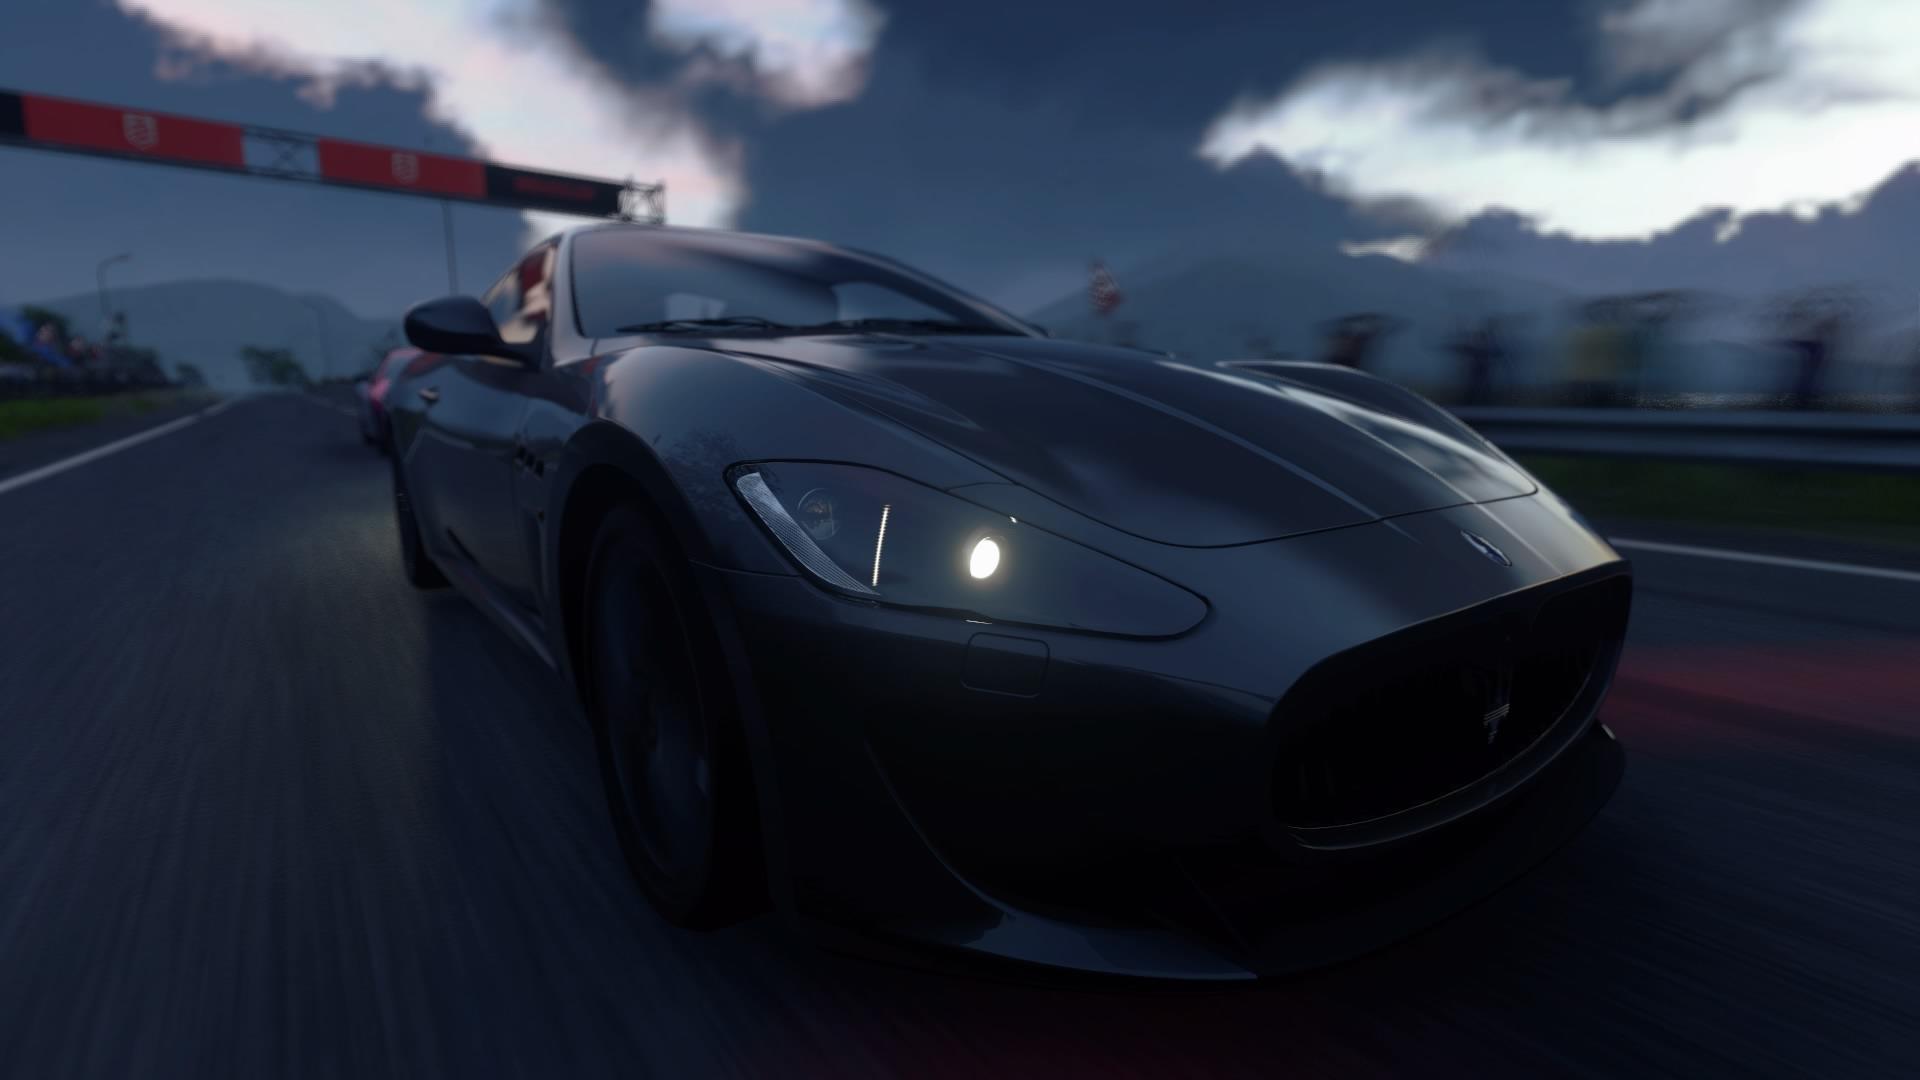 Wallpaper Driveclub Maserati Car Video Games 1920x1080